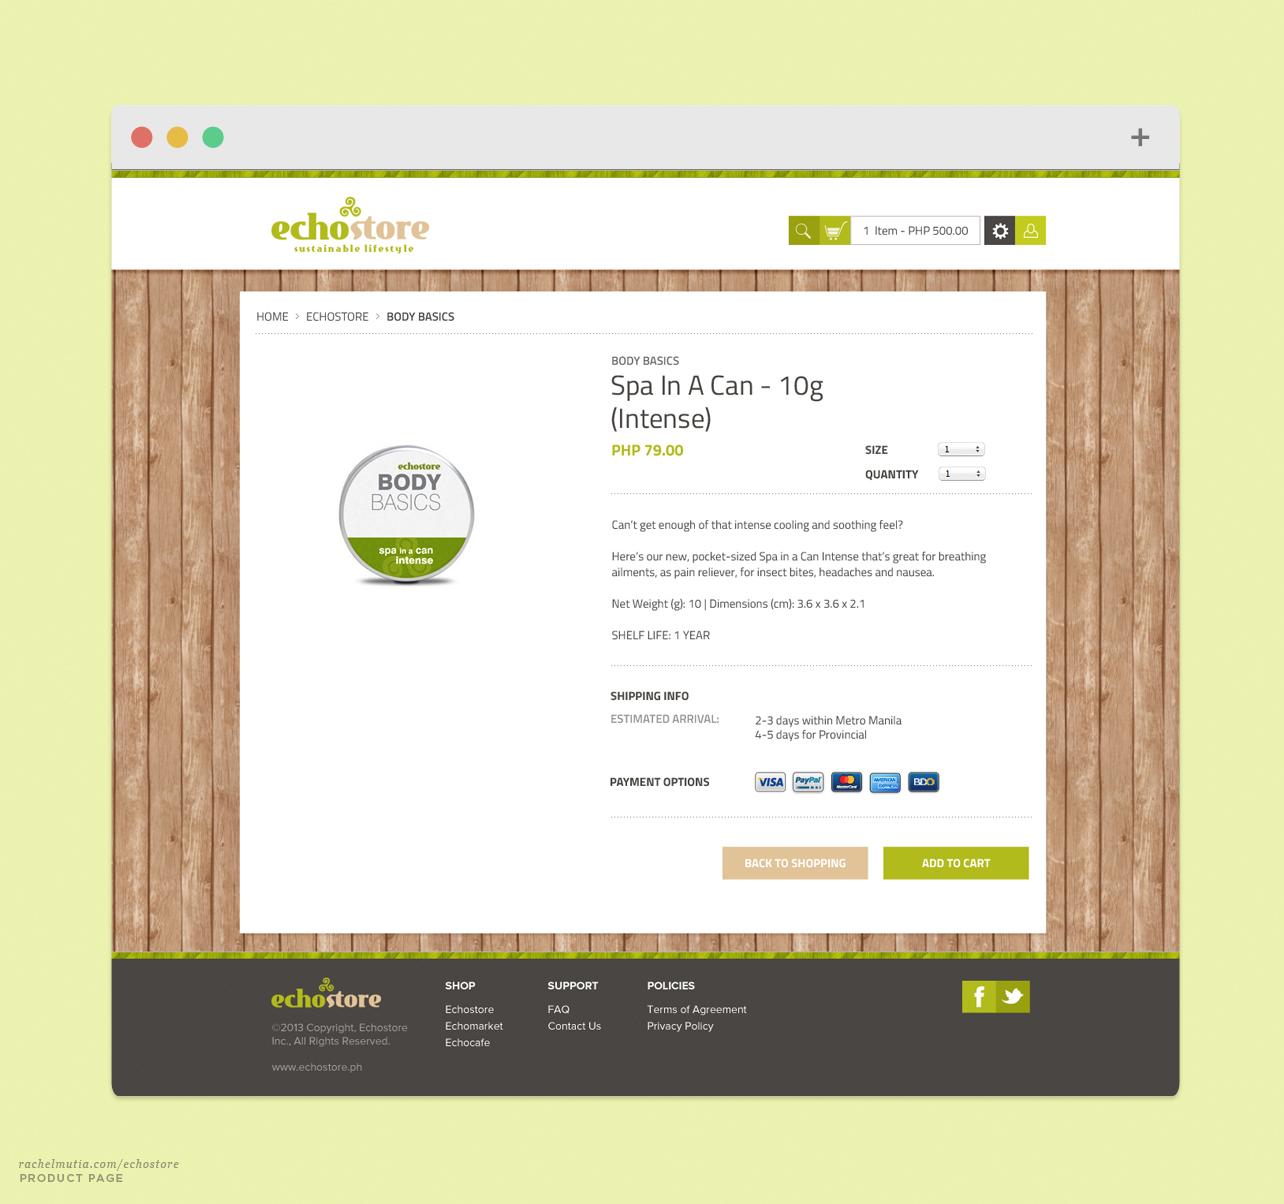 Echostore Product Page by Rachel Mutia